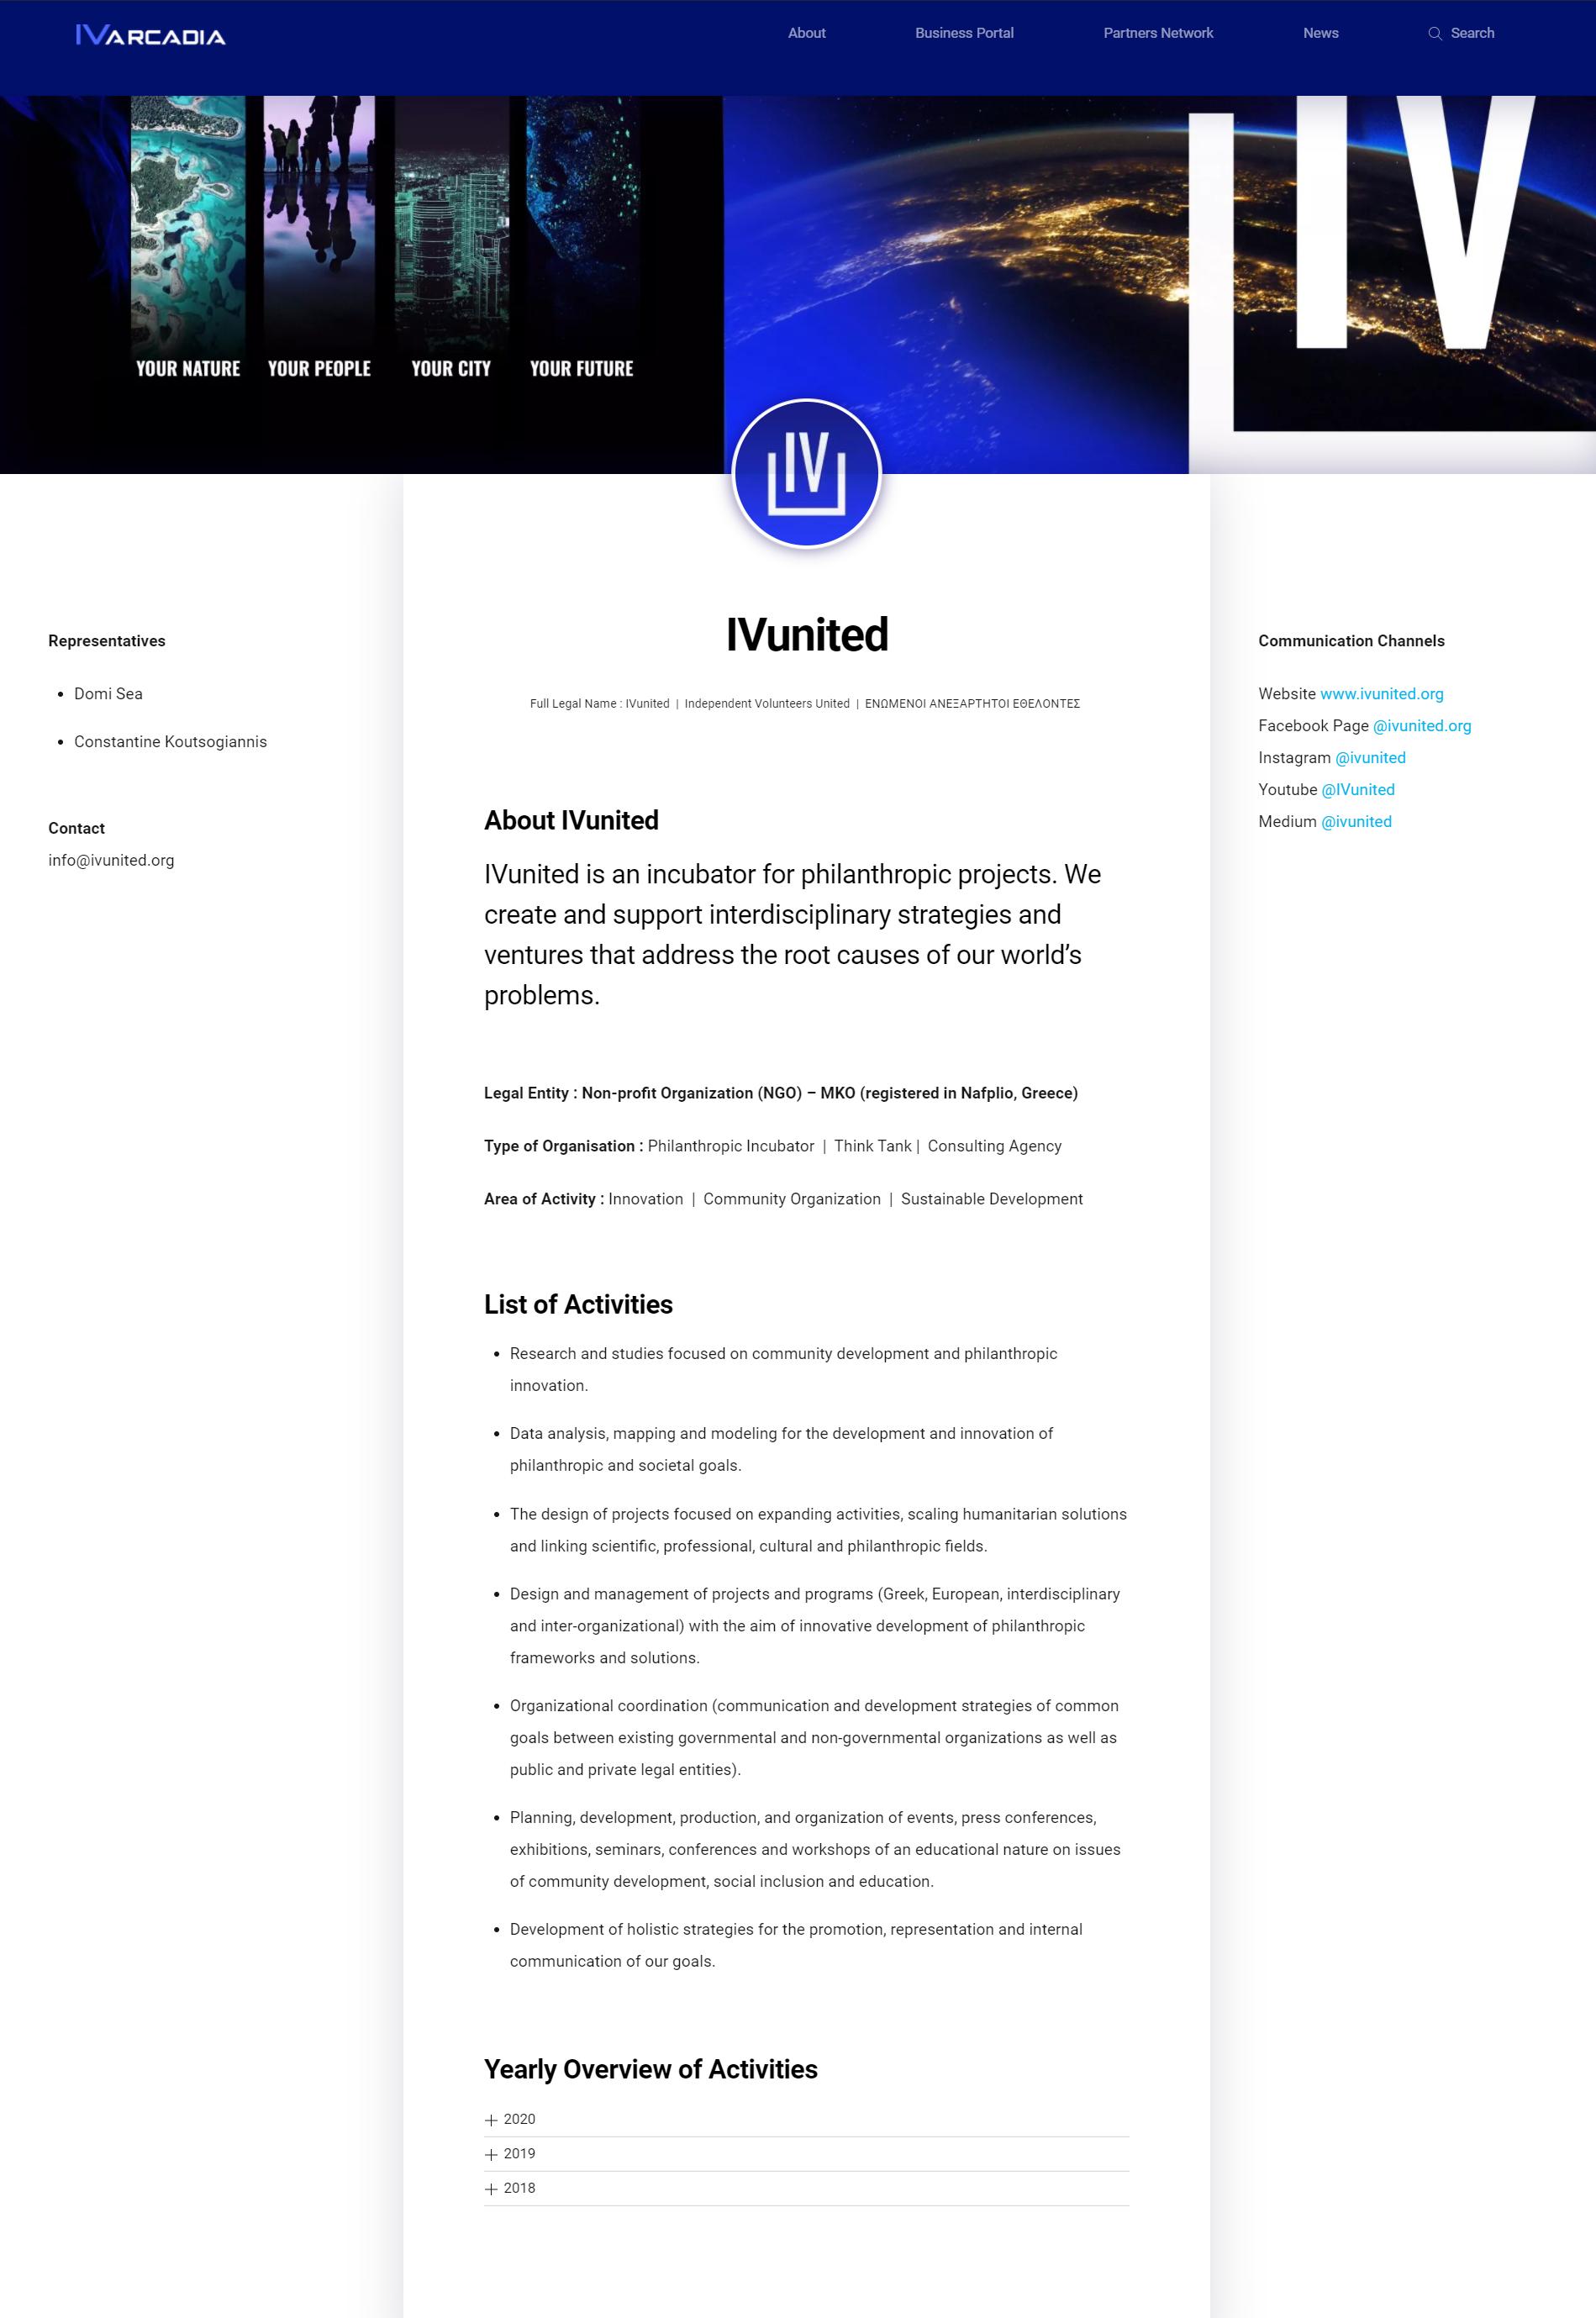 ivarcadia - partners network profile - ivunited